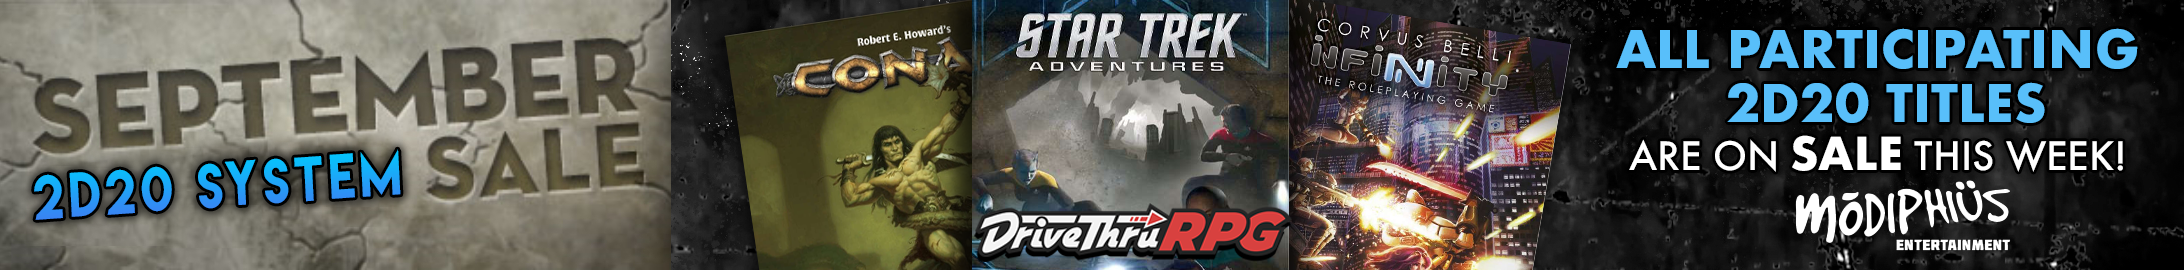 September 2d20 System Sale @ DriveThruRPG.com